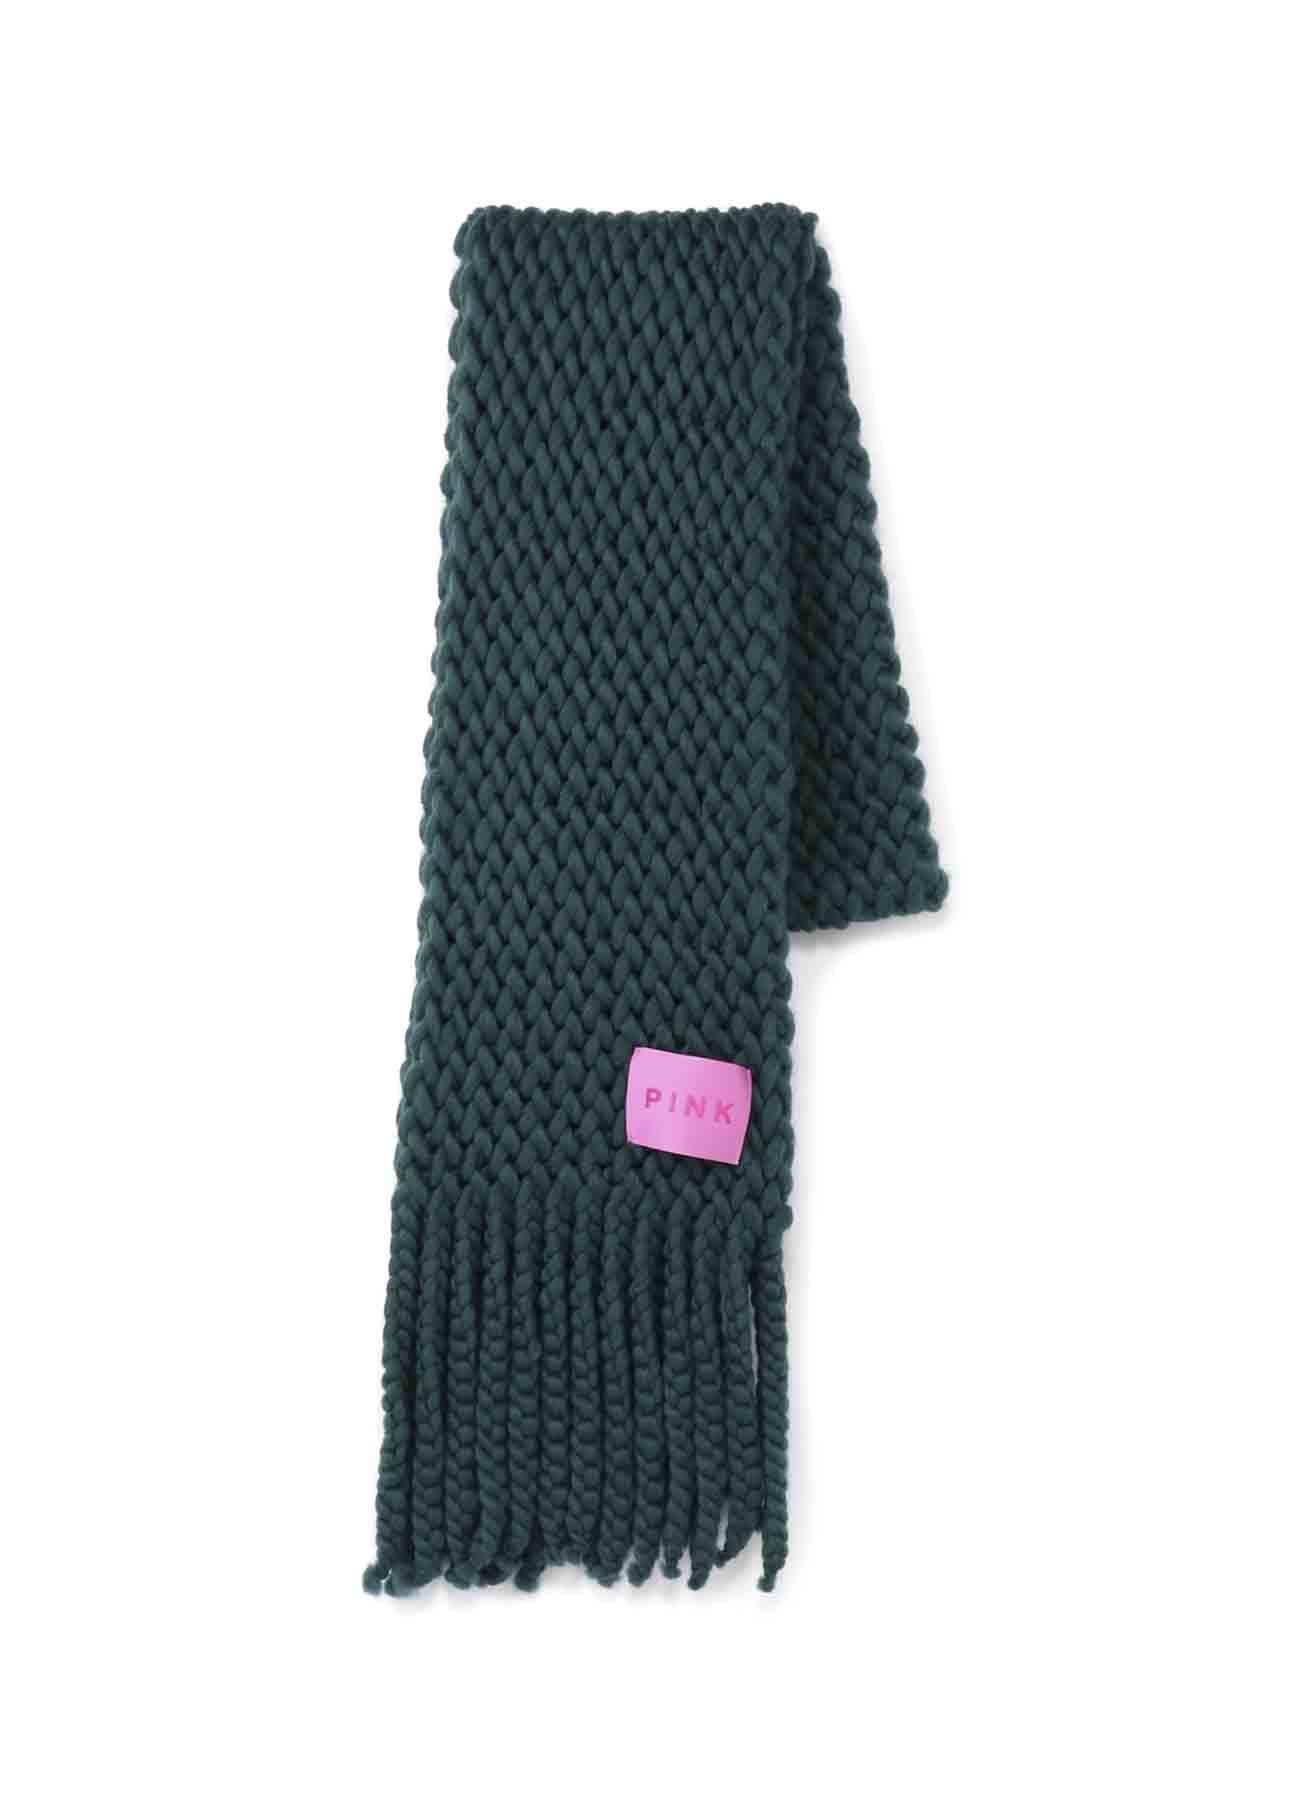 Y'SPINK FMS羊毛围巾